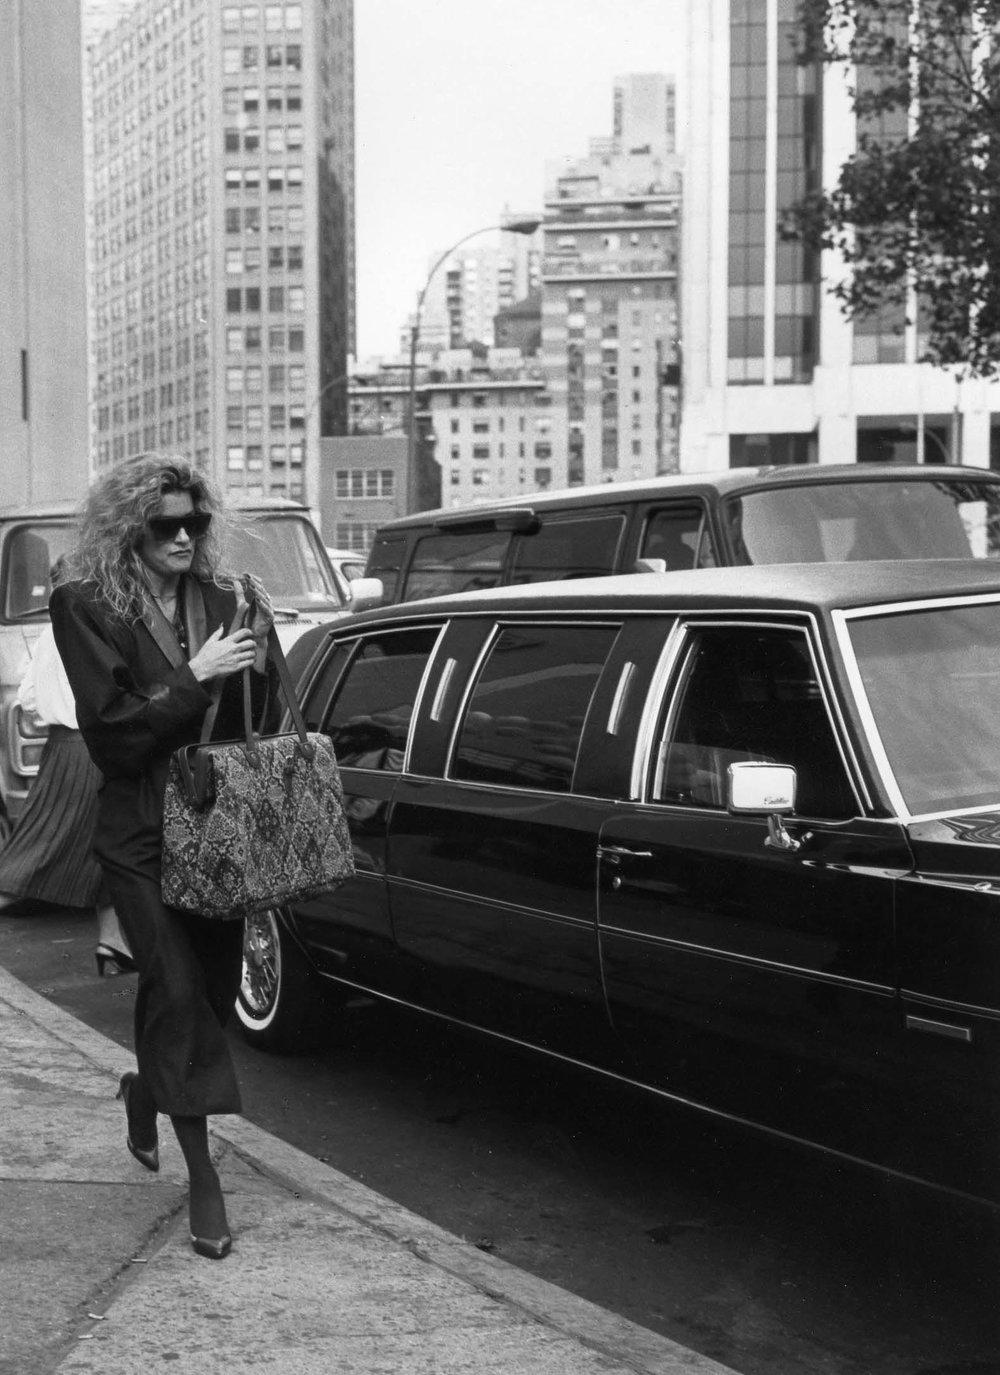 Limousine, New York 1985